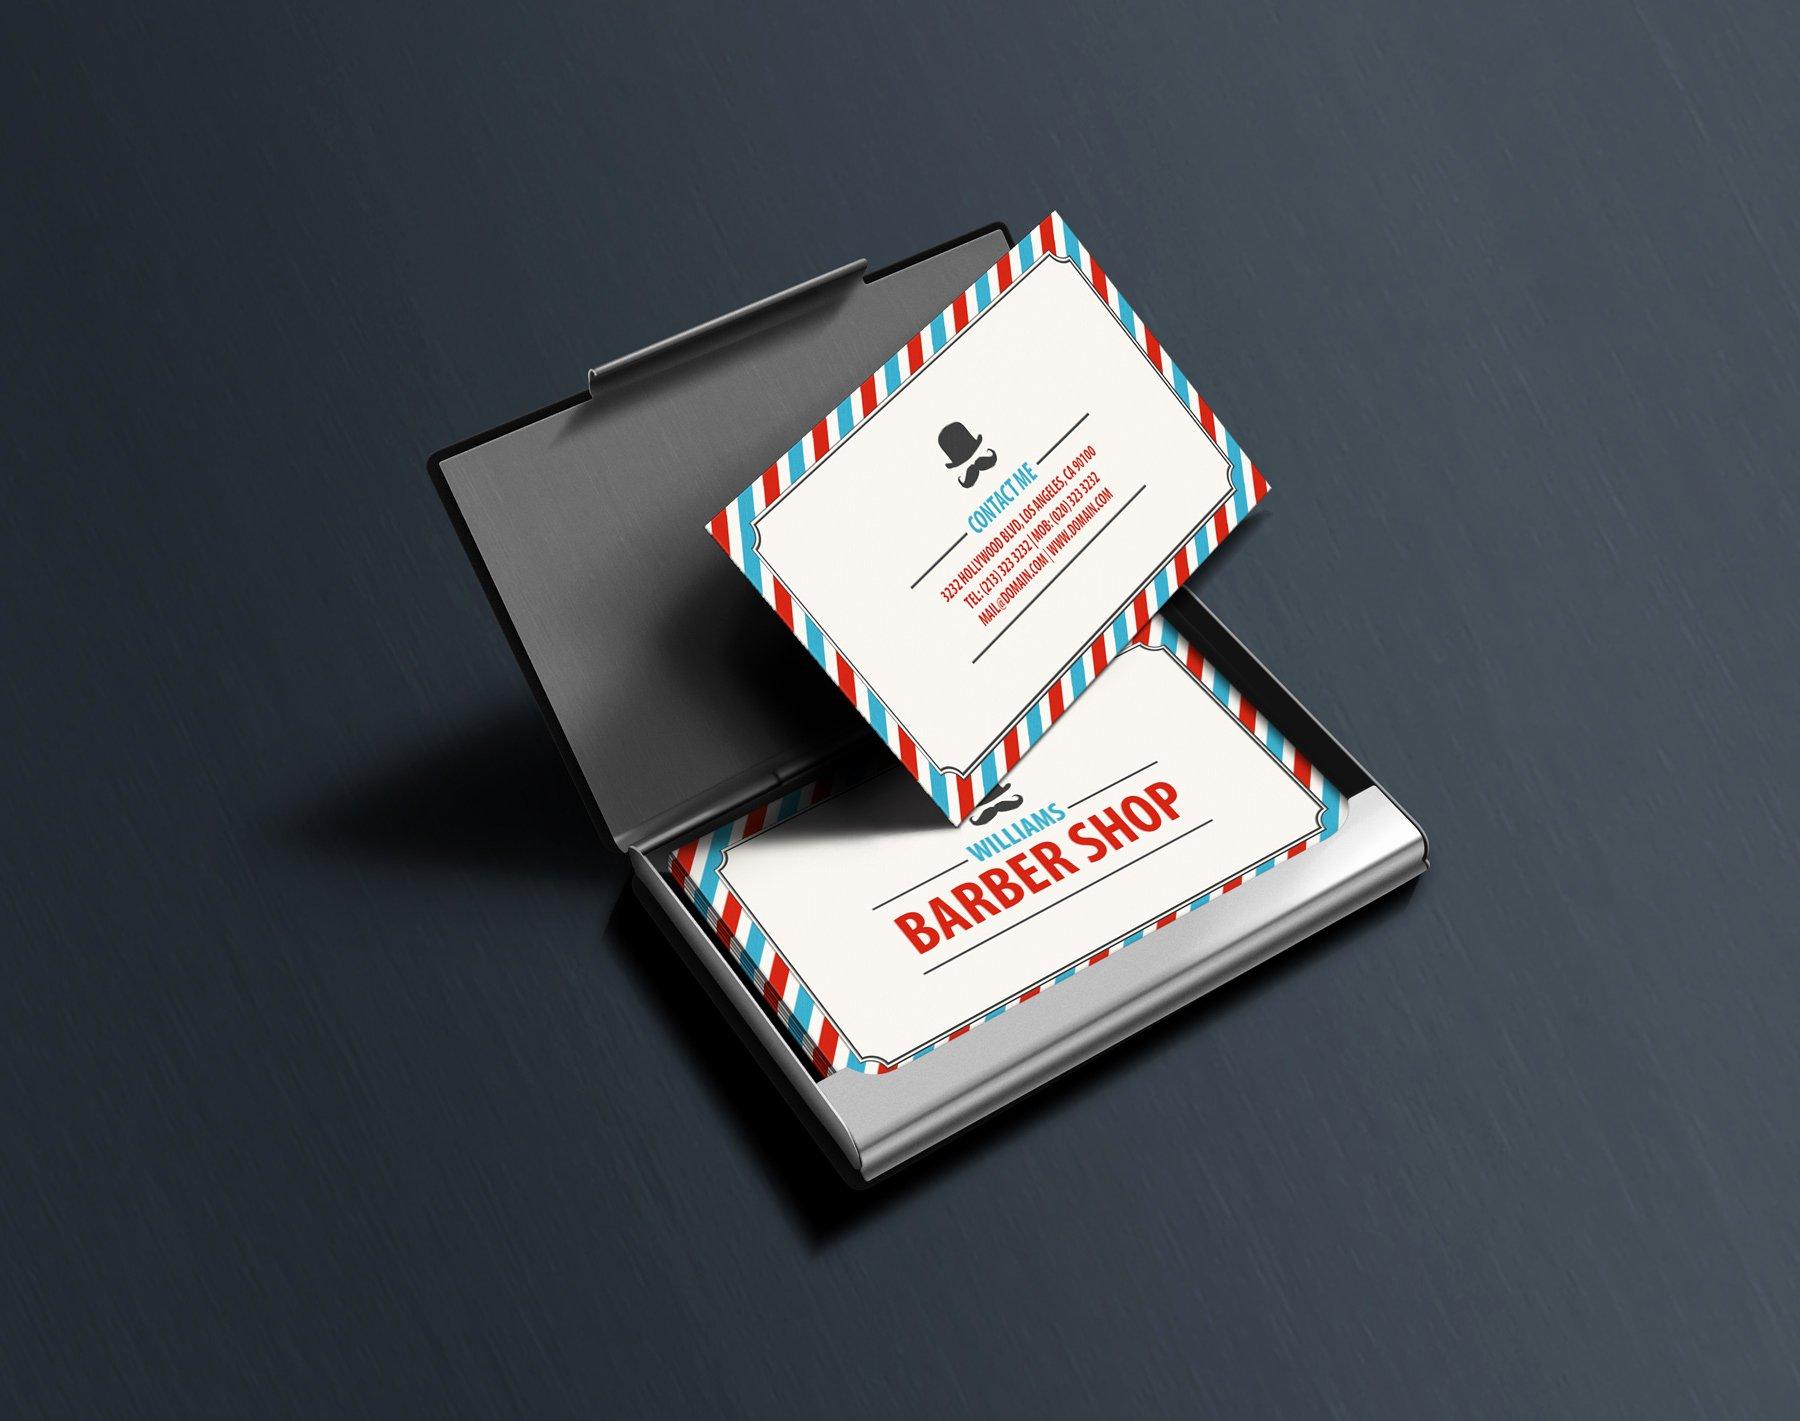 Barber Business Card Template Beautiful Classic Barbershop Business Cards J32 Design